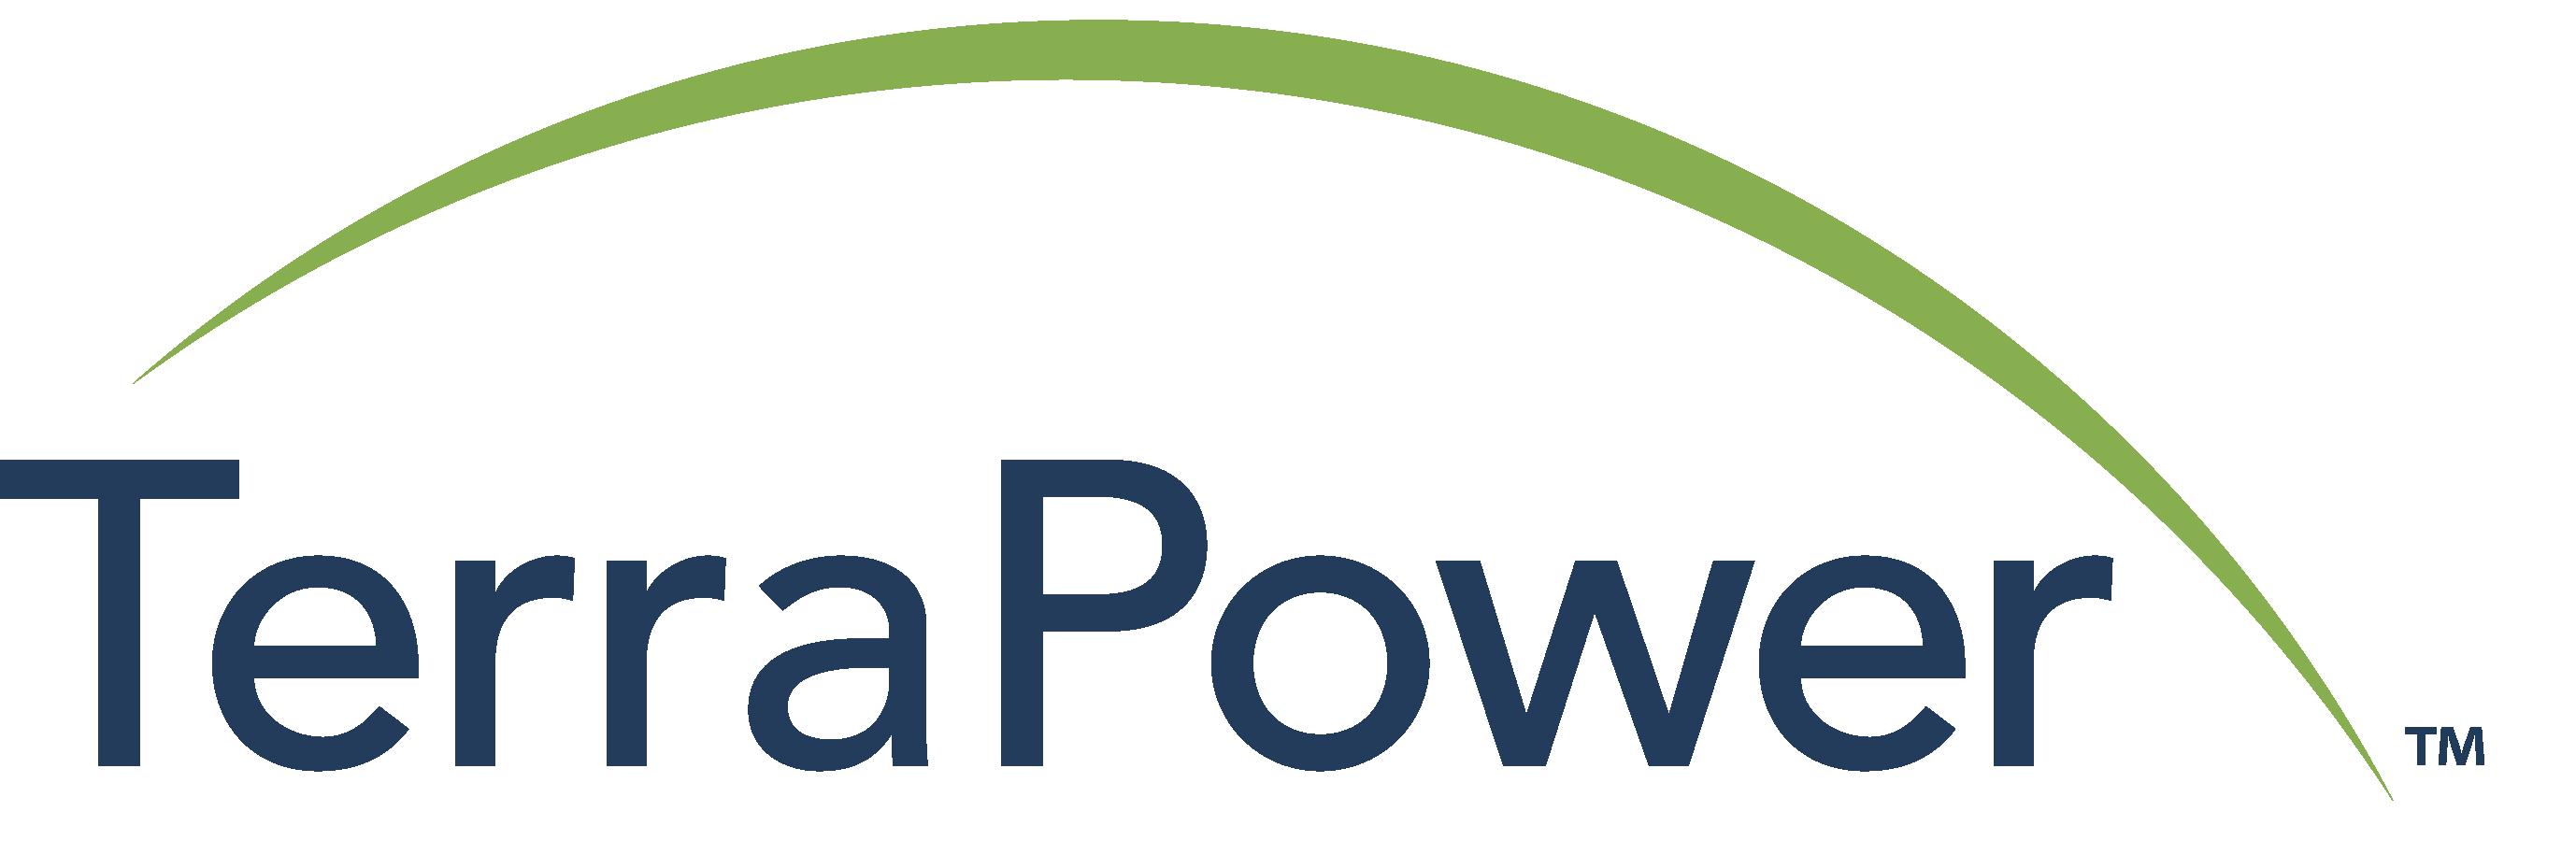 TerraPower, LLC